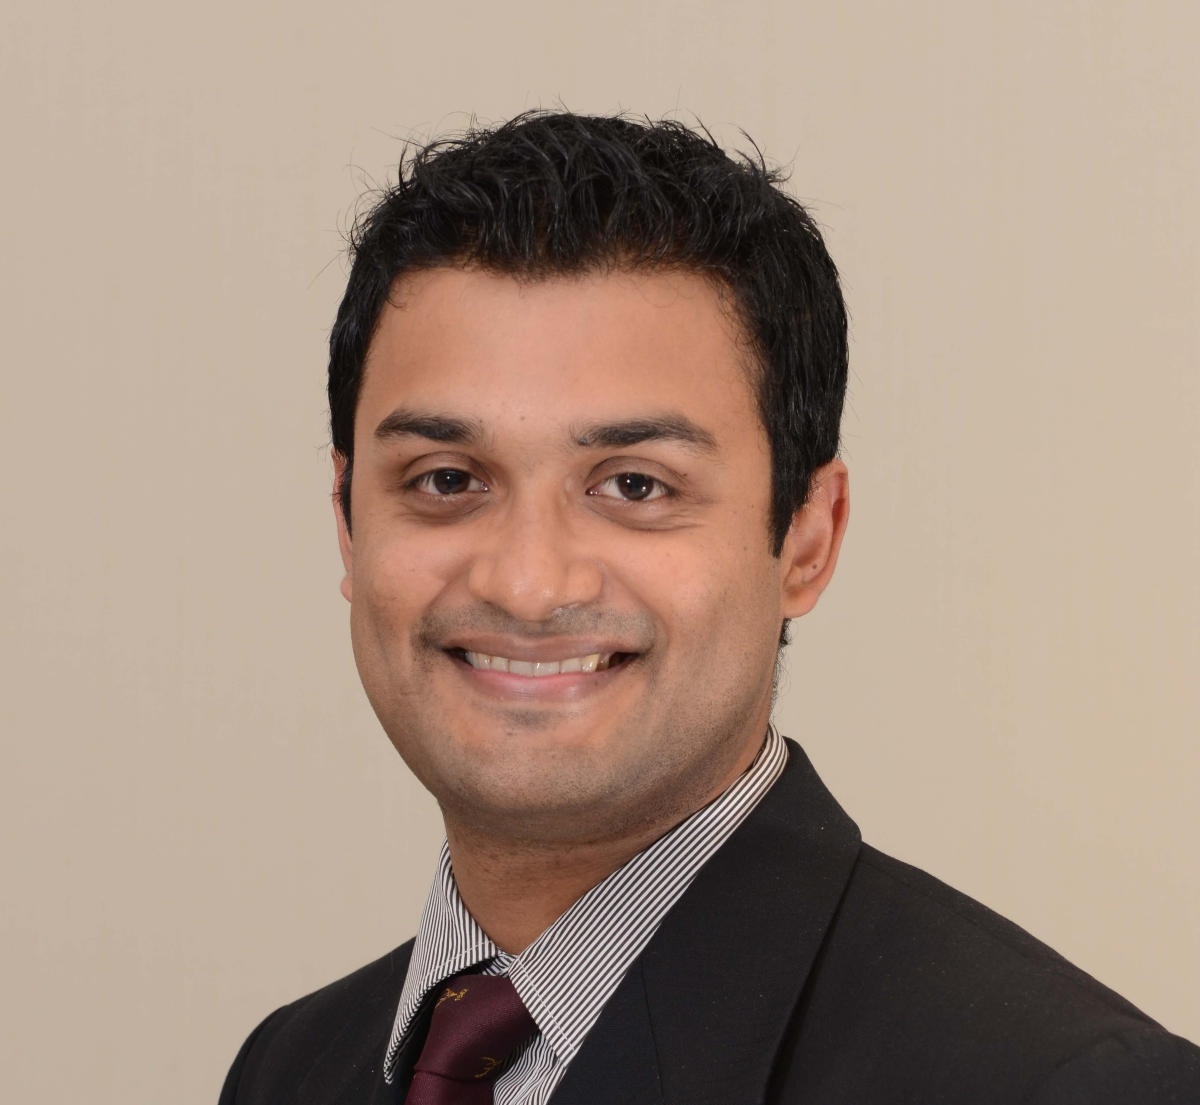 Aditya Kurian